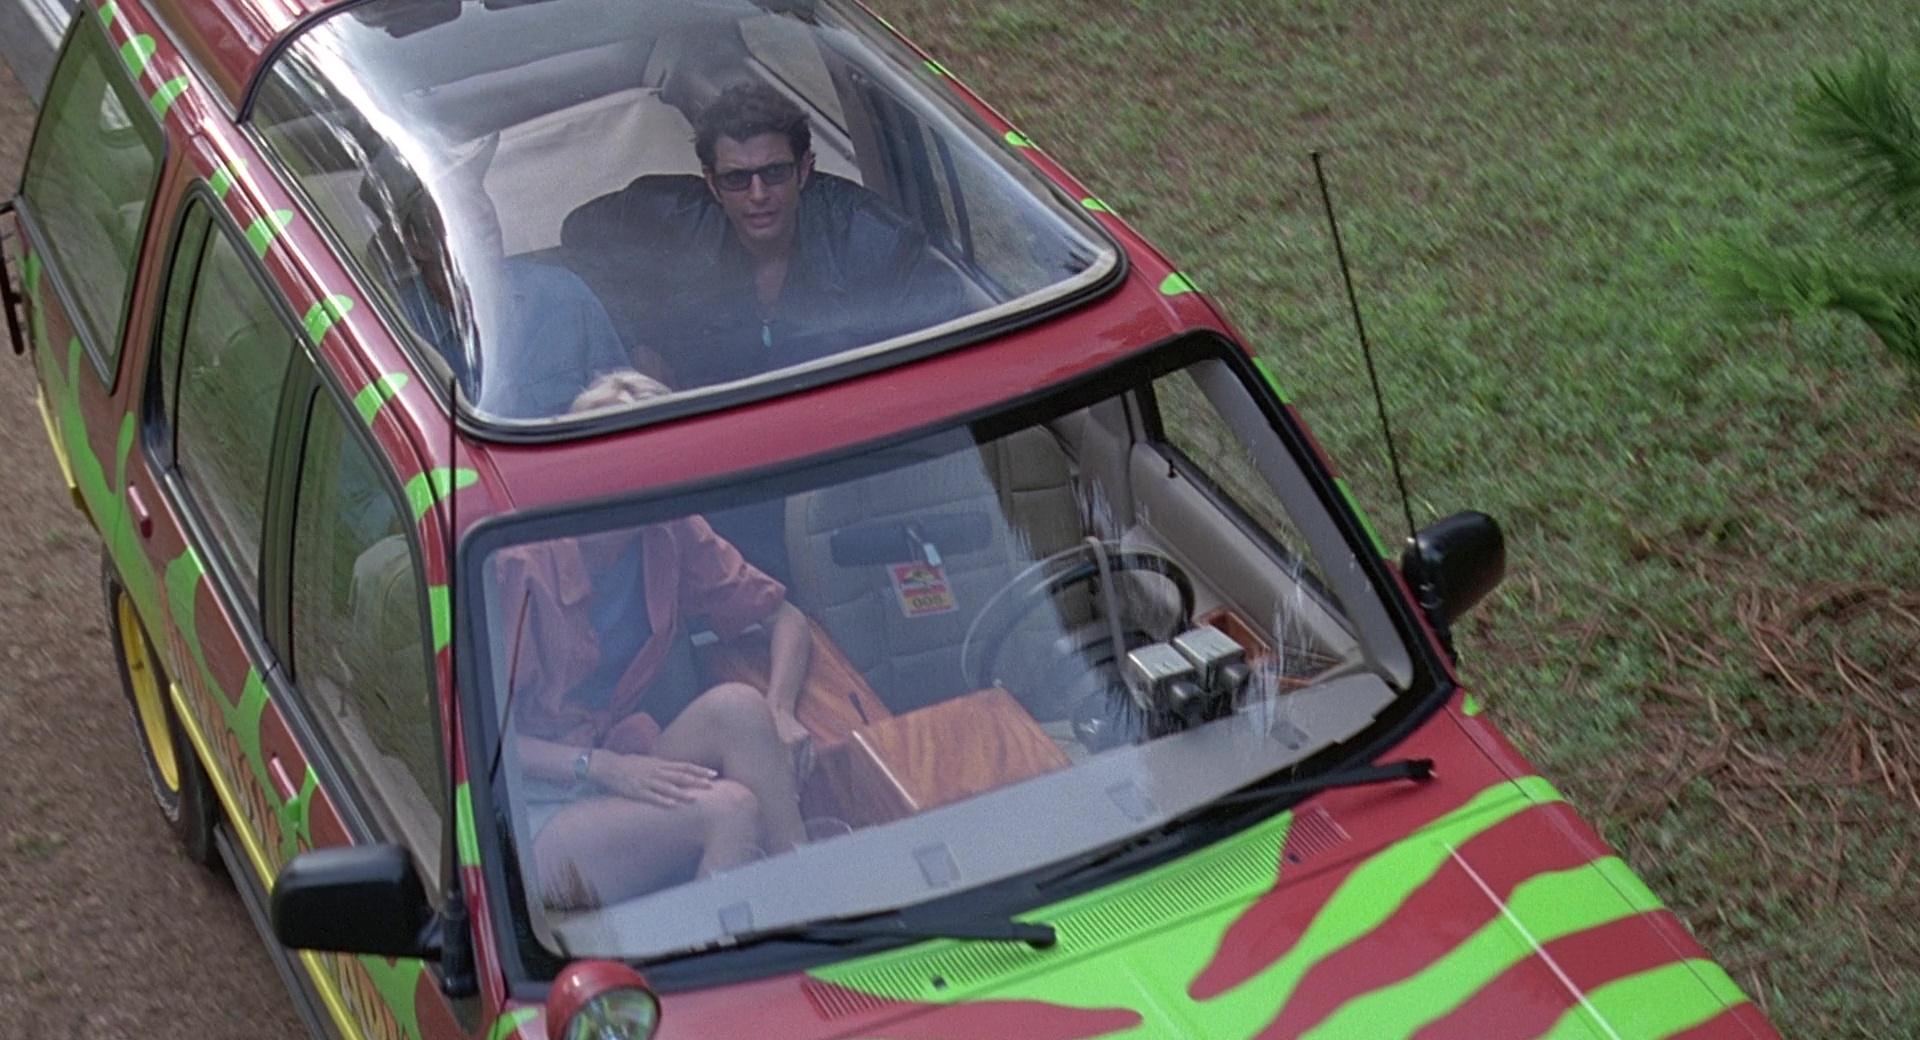 Ford Explorer Cars In Jurassic Park 1993 Movie